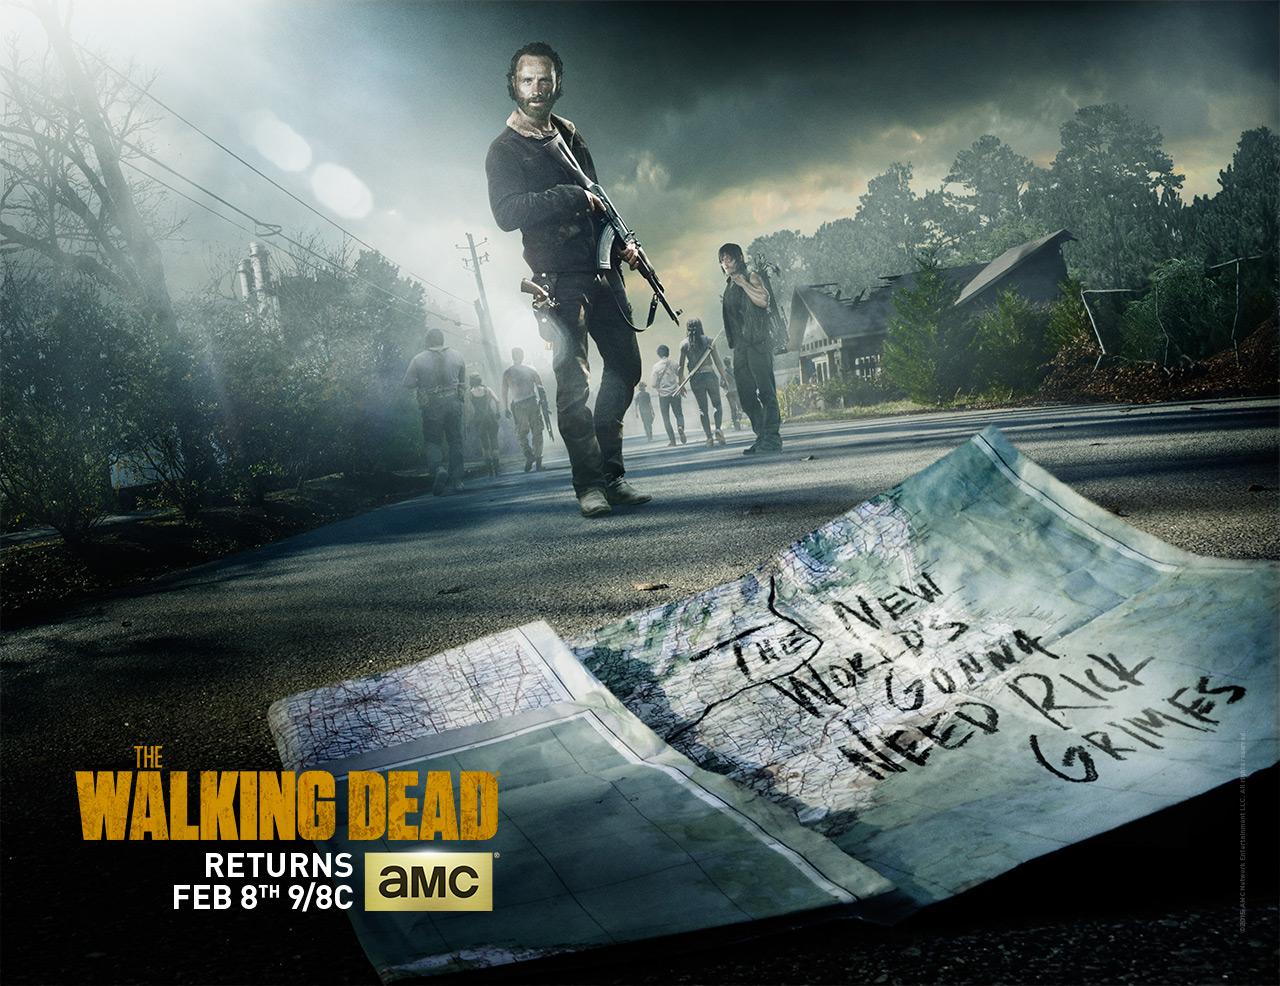 The Walking Dead: Emily Kinney is set to return after her farewell in season 5